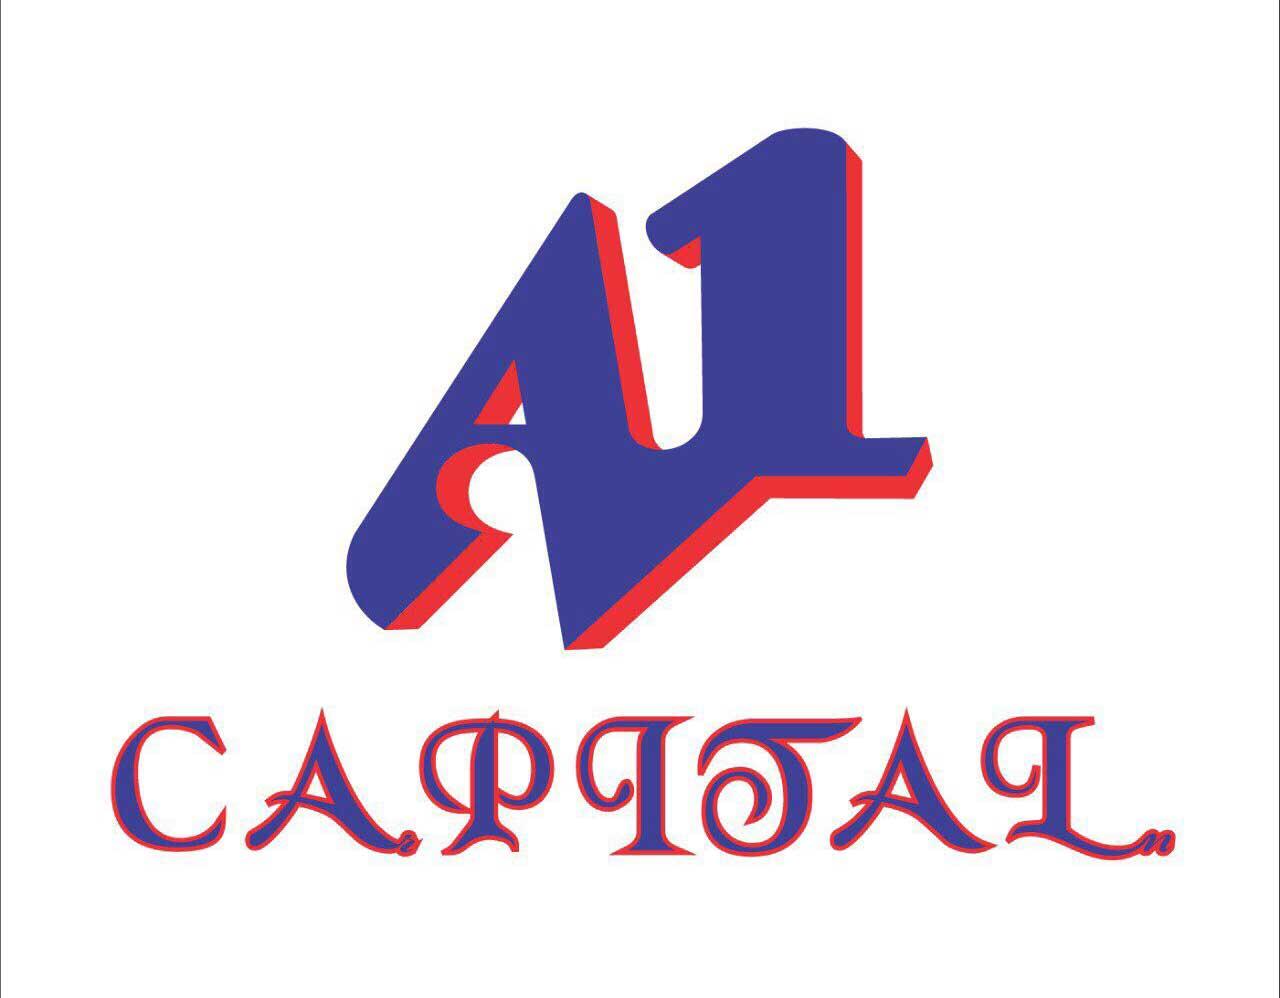 A1 Capital Myanmar